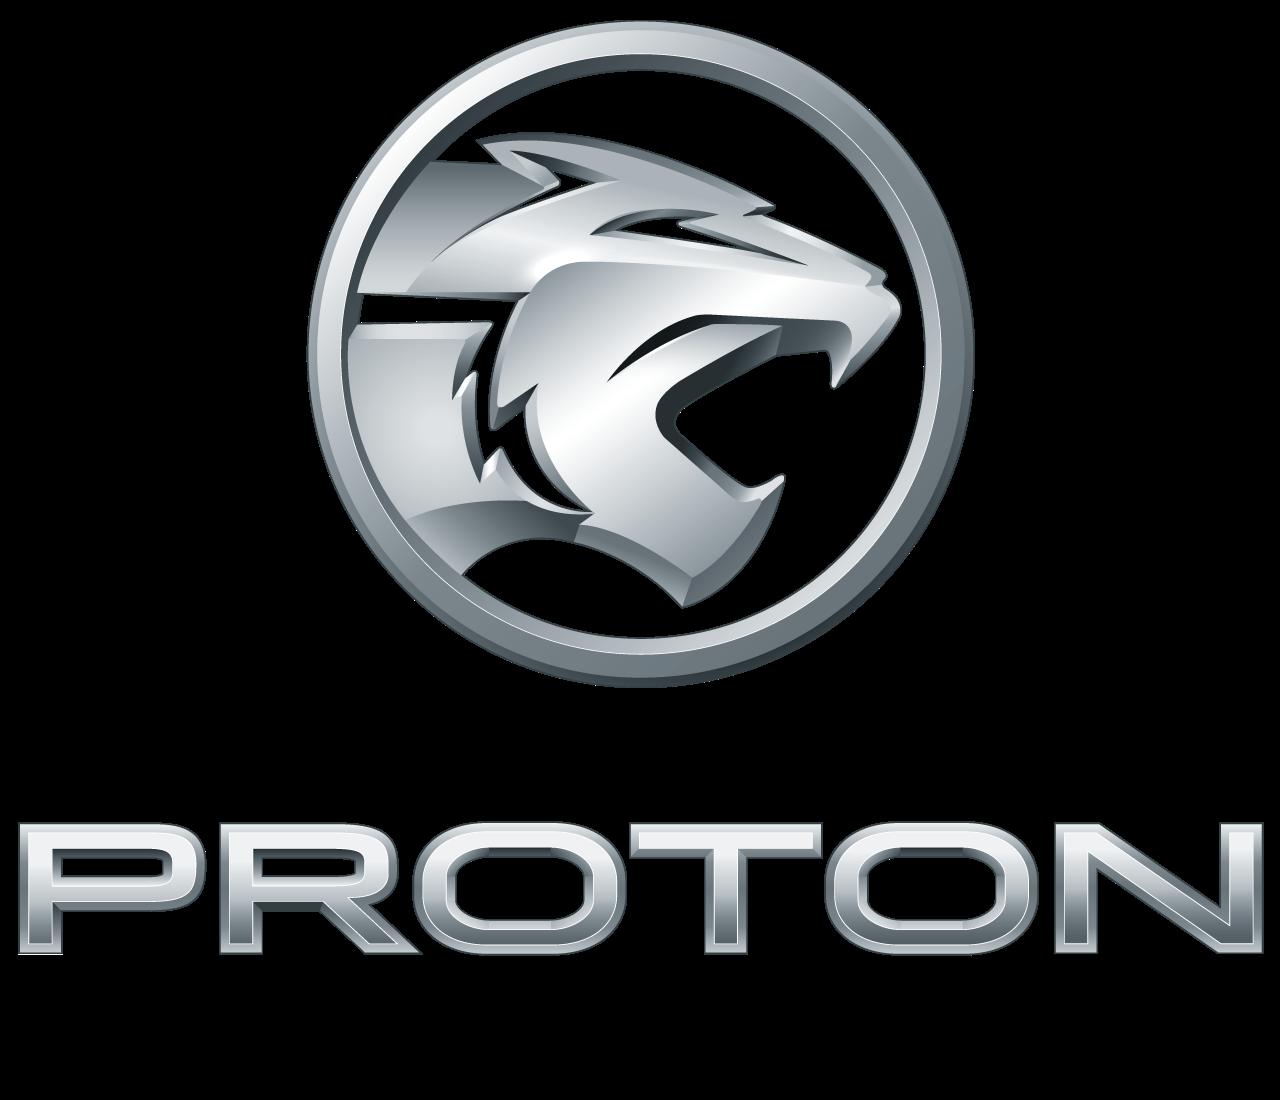 gtimedia-gradmalaysia-Proton-logo-2019